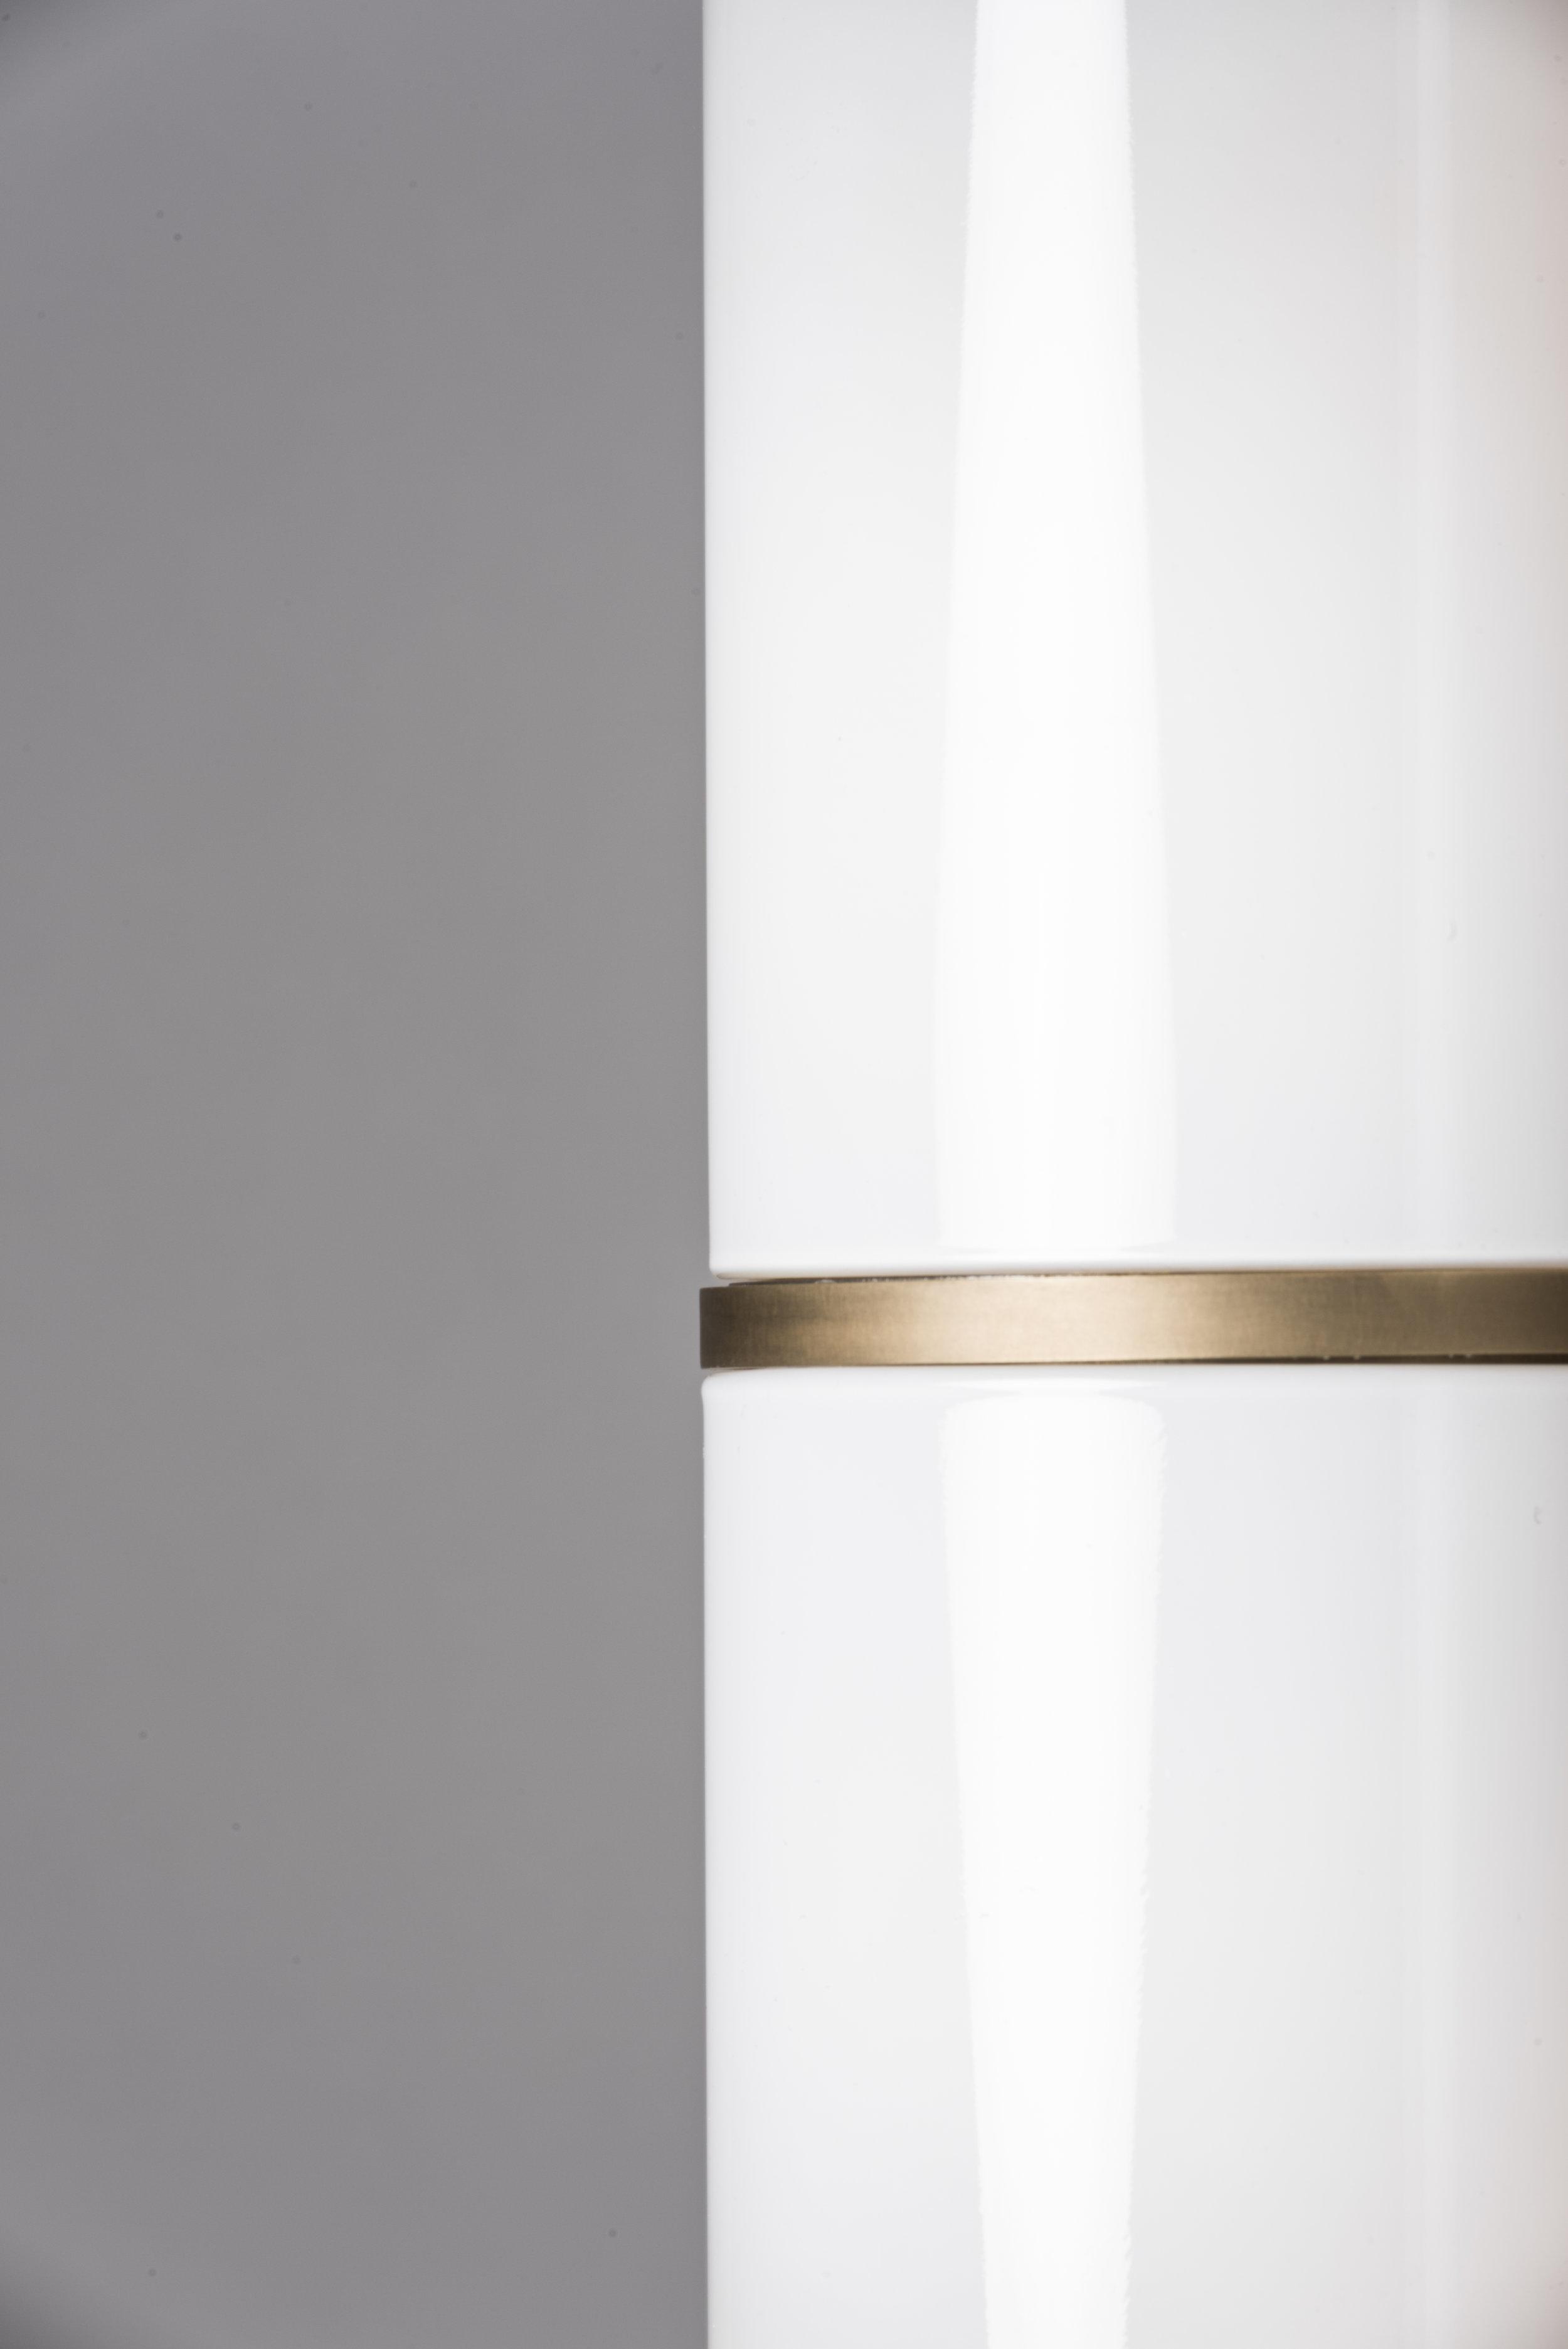 Federico Peri_Charlotte lamp M_Nilufar gallery_detail©Daniele Iodice.jpg